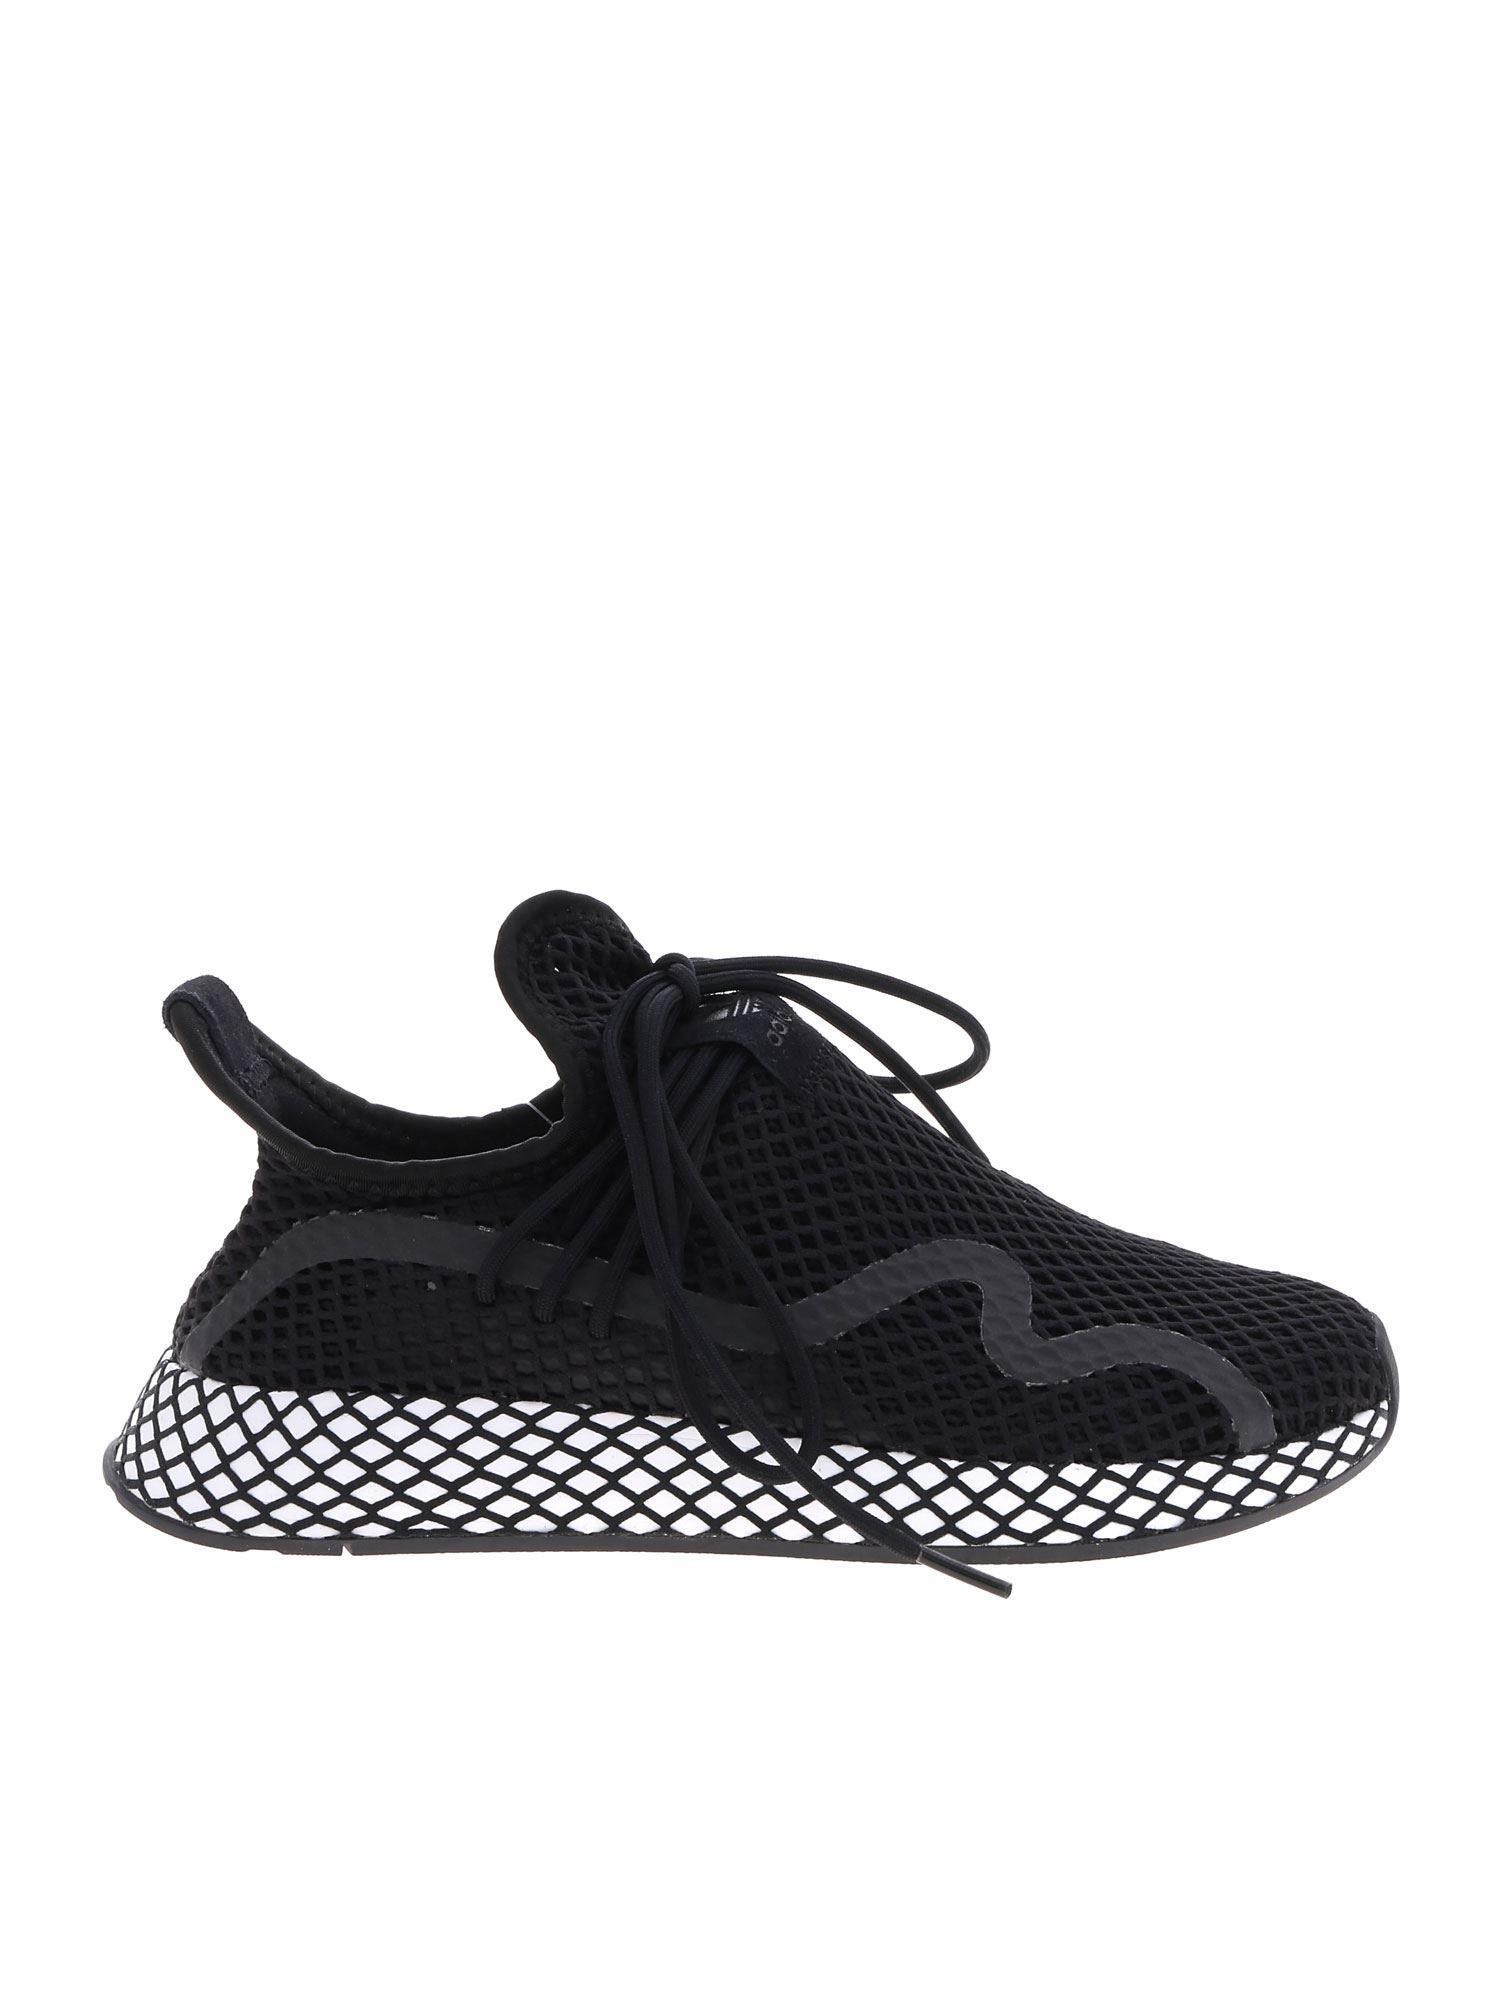 9ff8589bb Lyst - adidas Originals Deerupt S Sneakers In Black in Black for Men